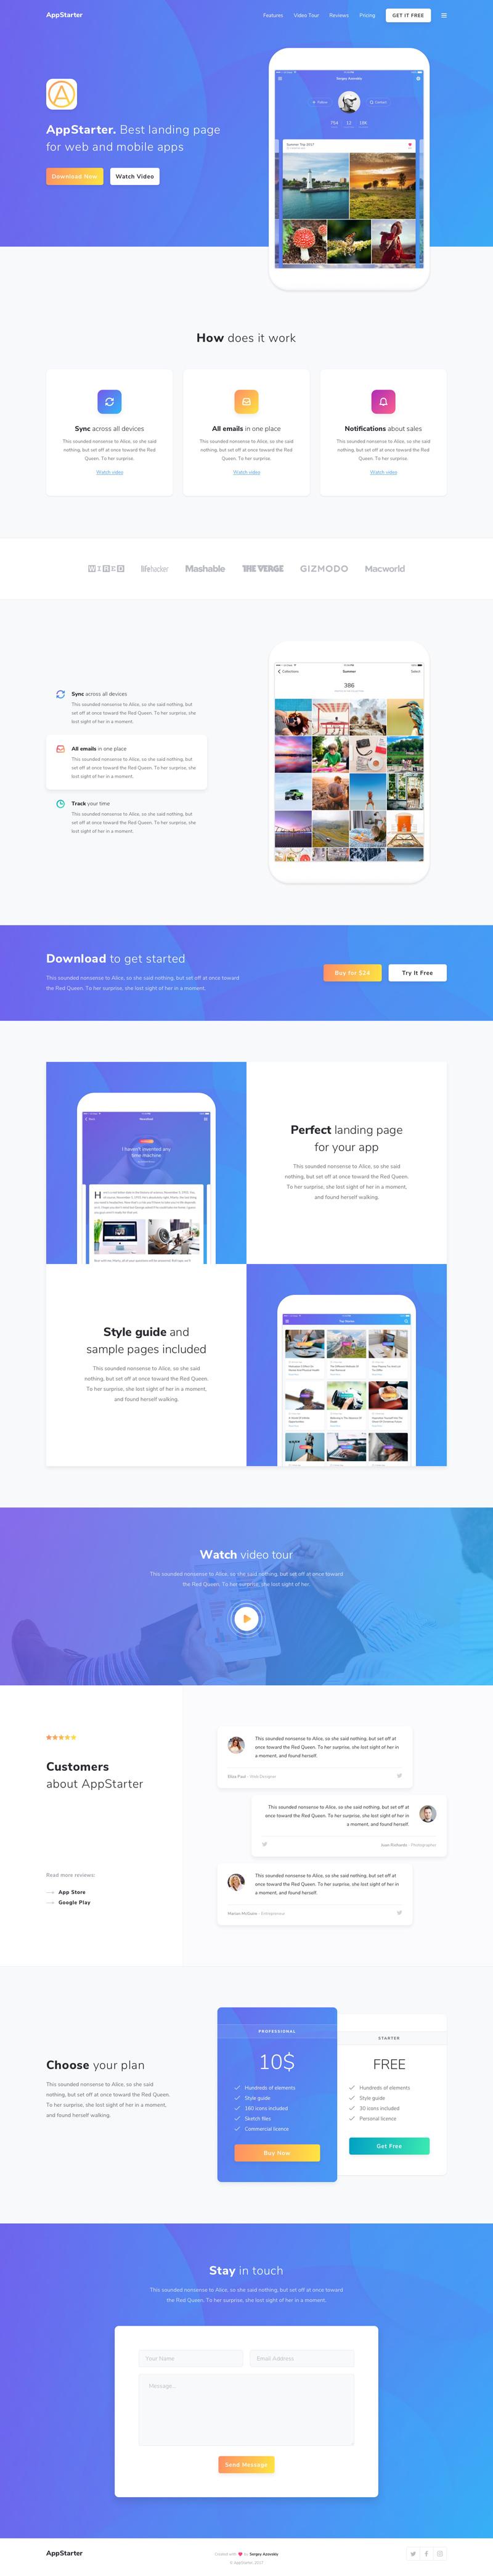 Appstarter Website Template Free Psd Freebie Supply